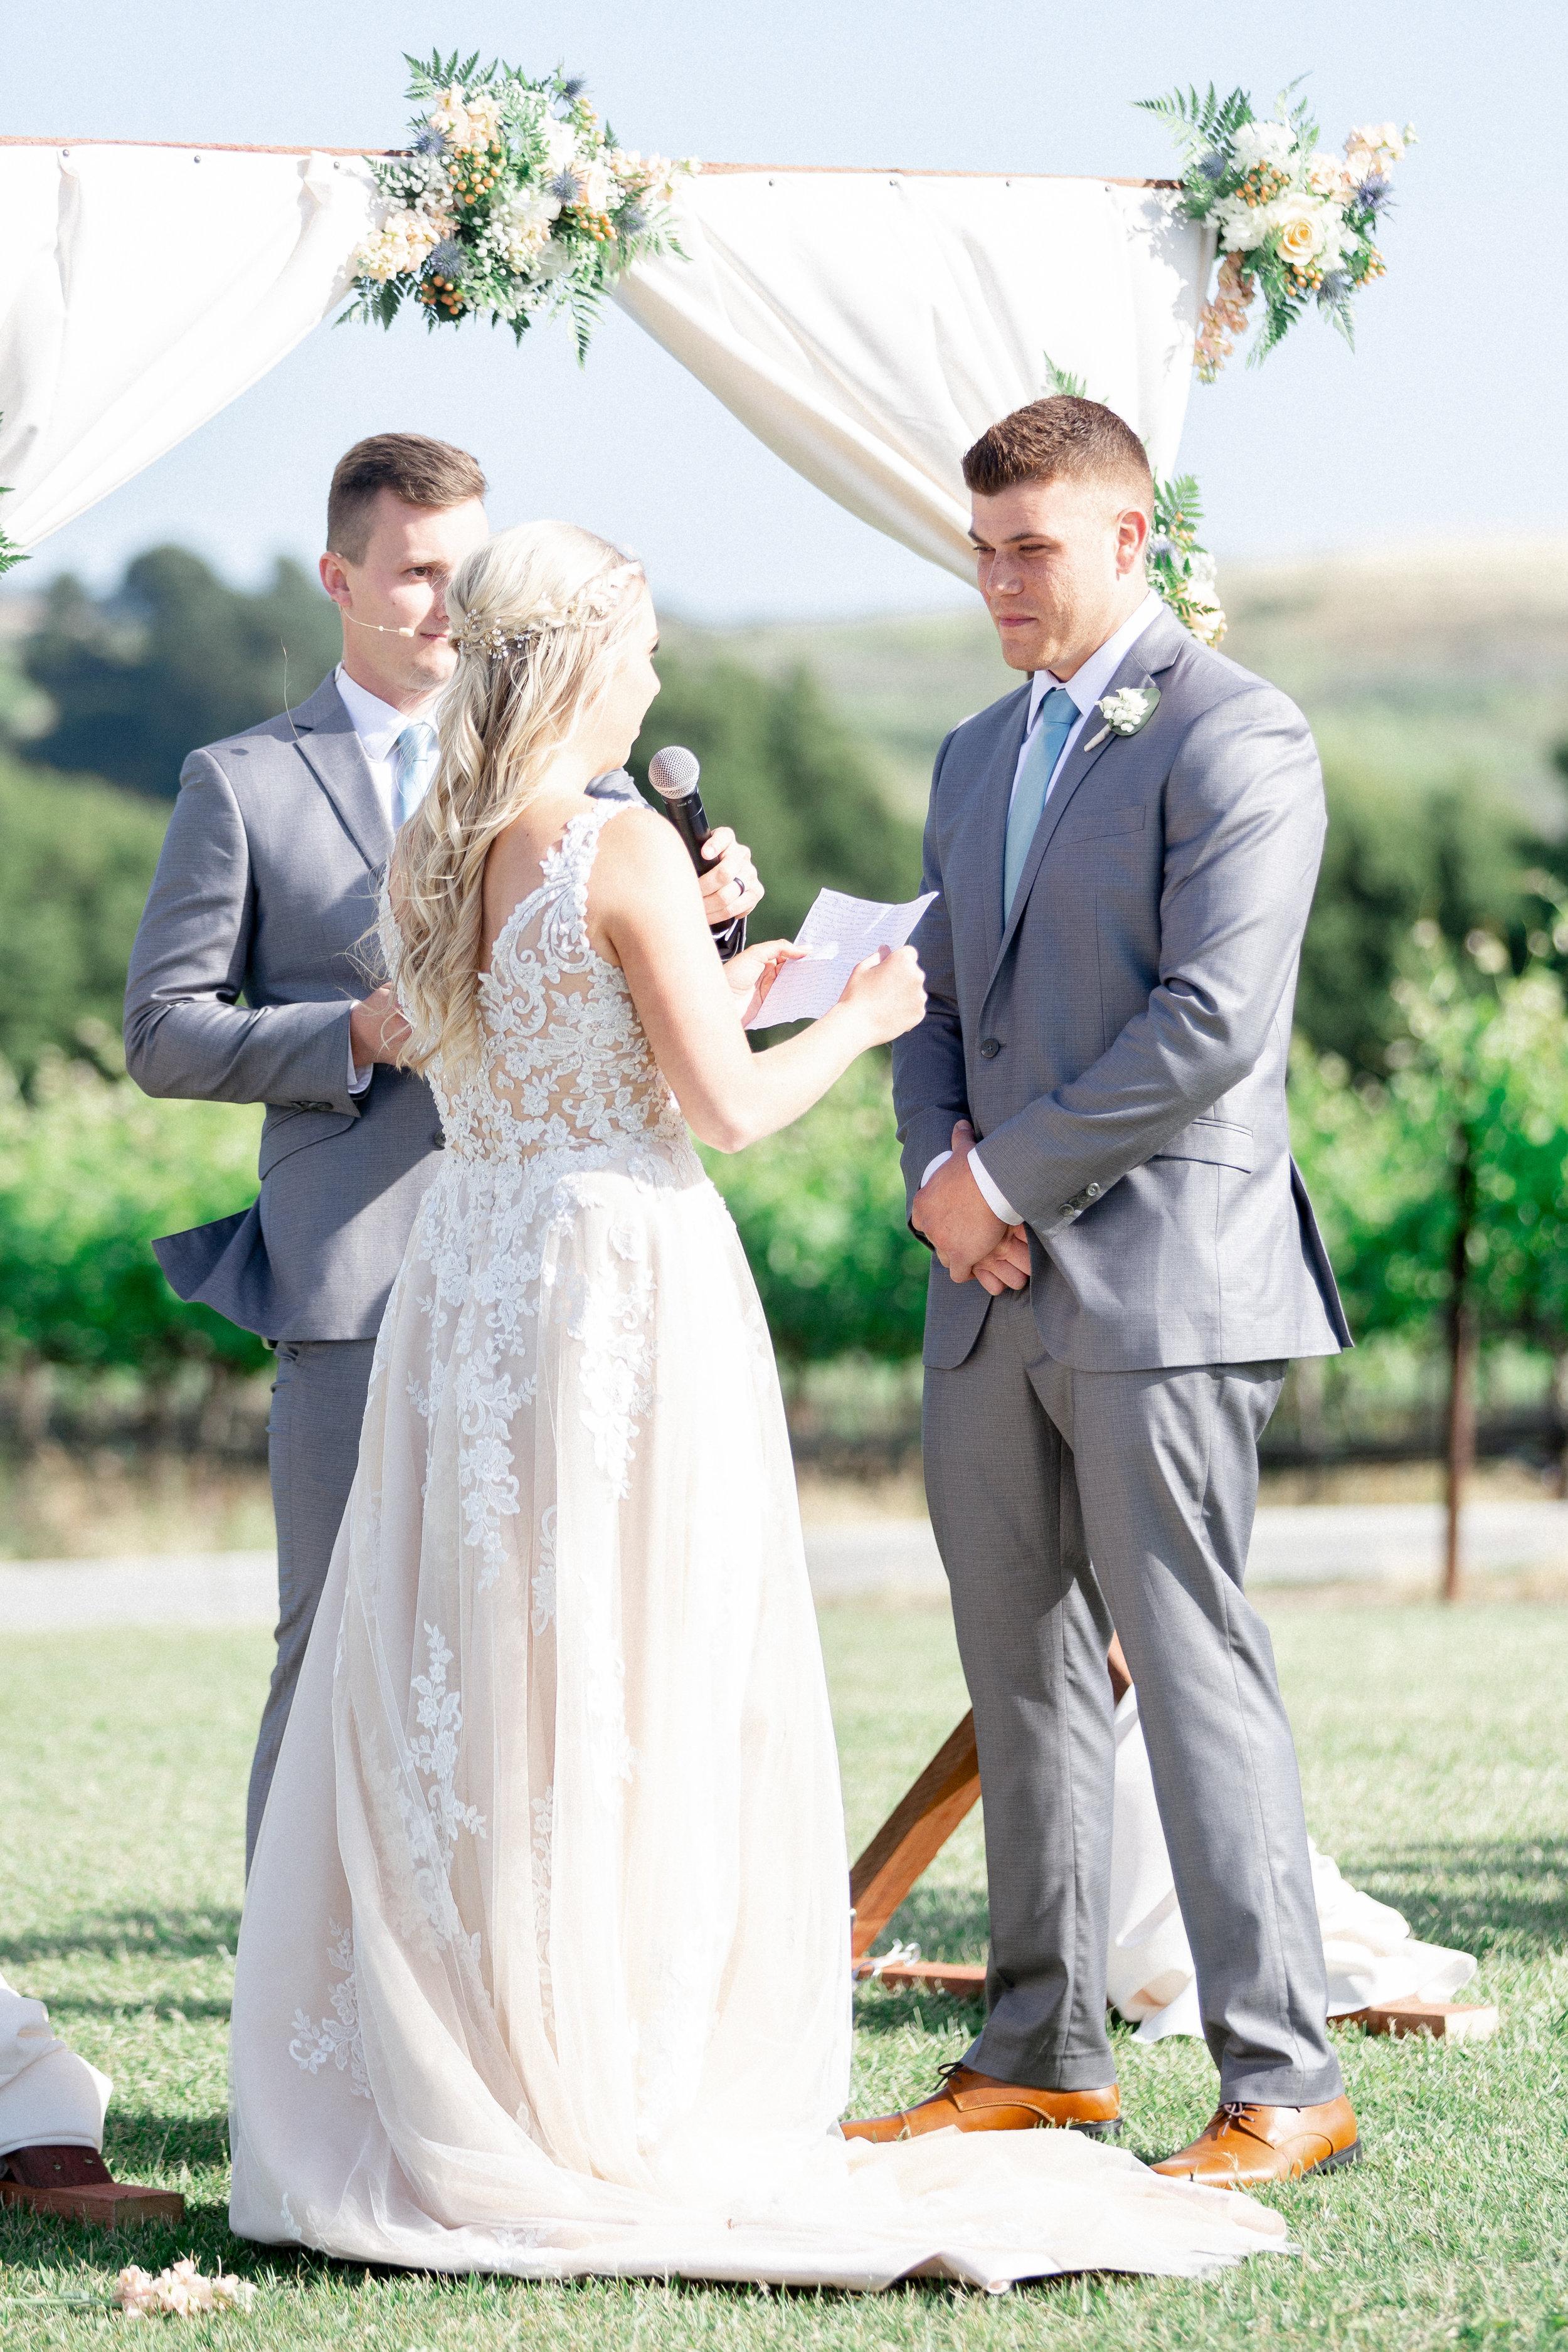 Eagle-Vines-Golf-Course-wedding-photographer (108 of 206).jpg